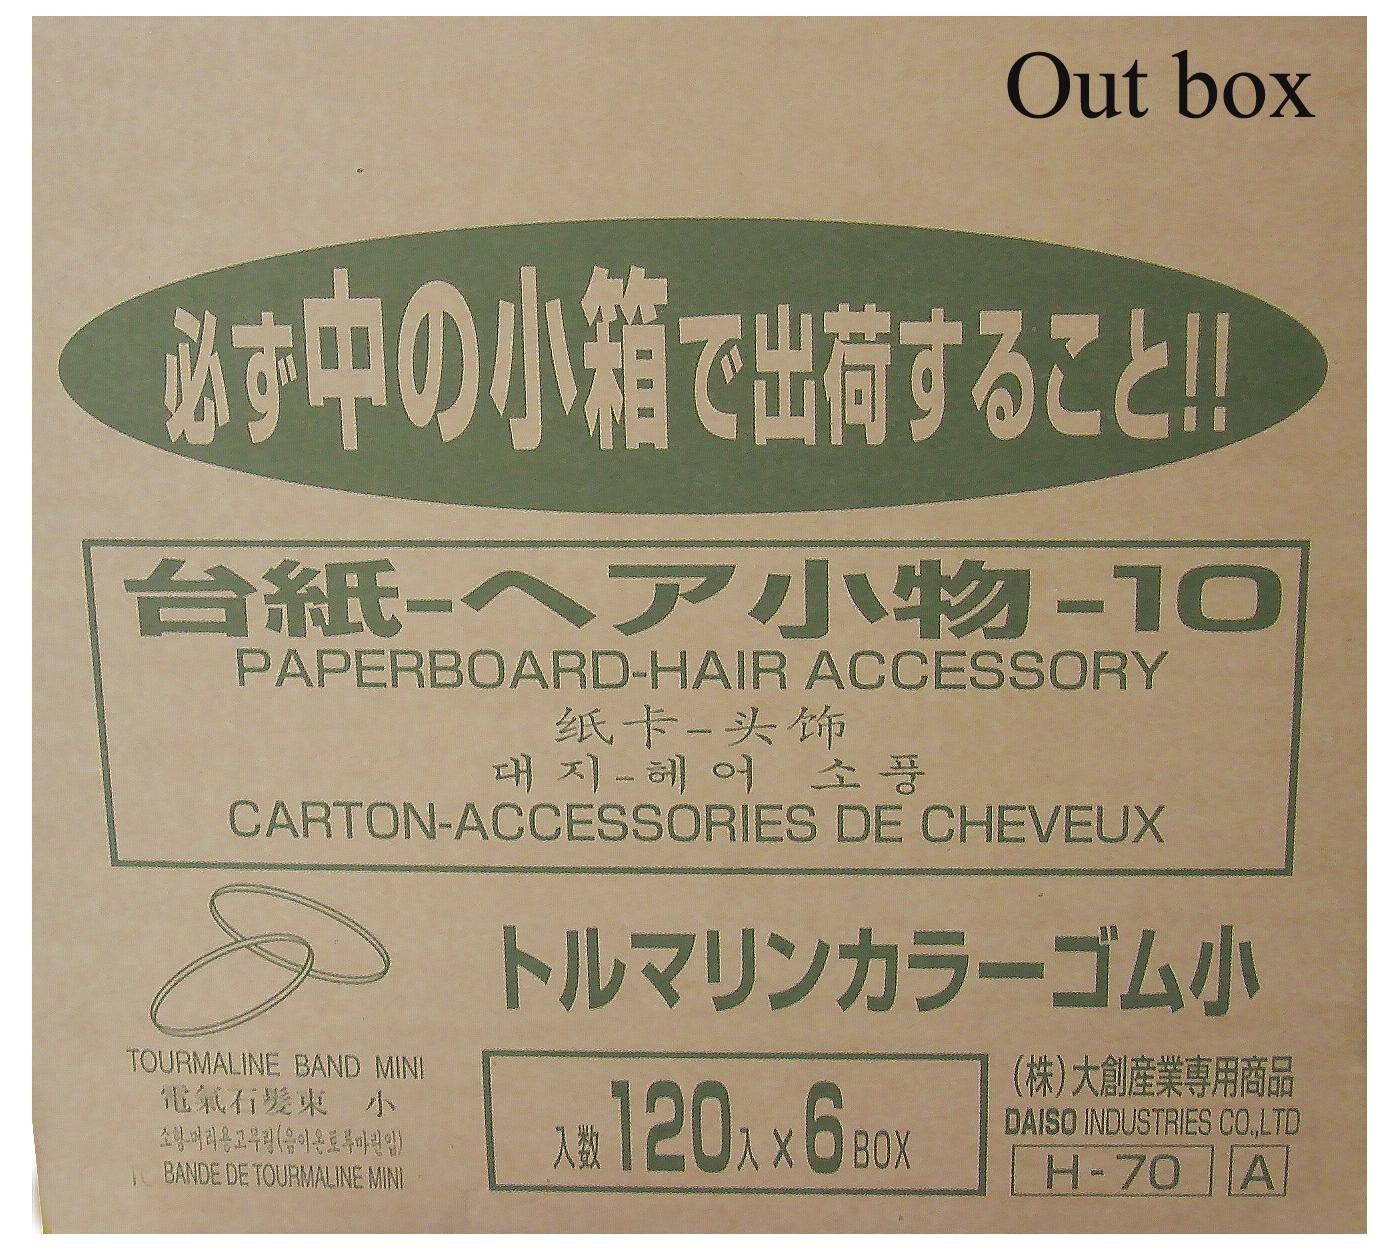 OEM out box.jpg